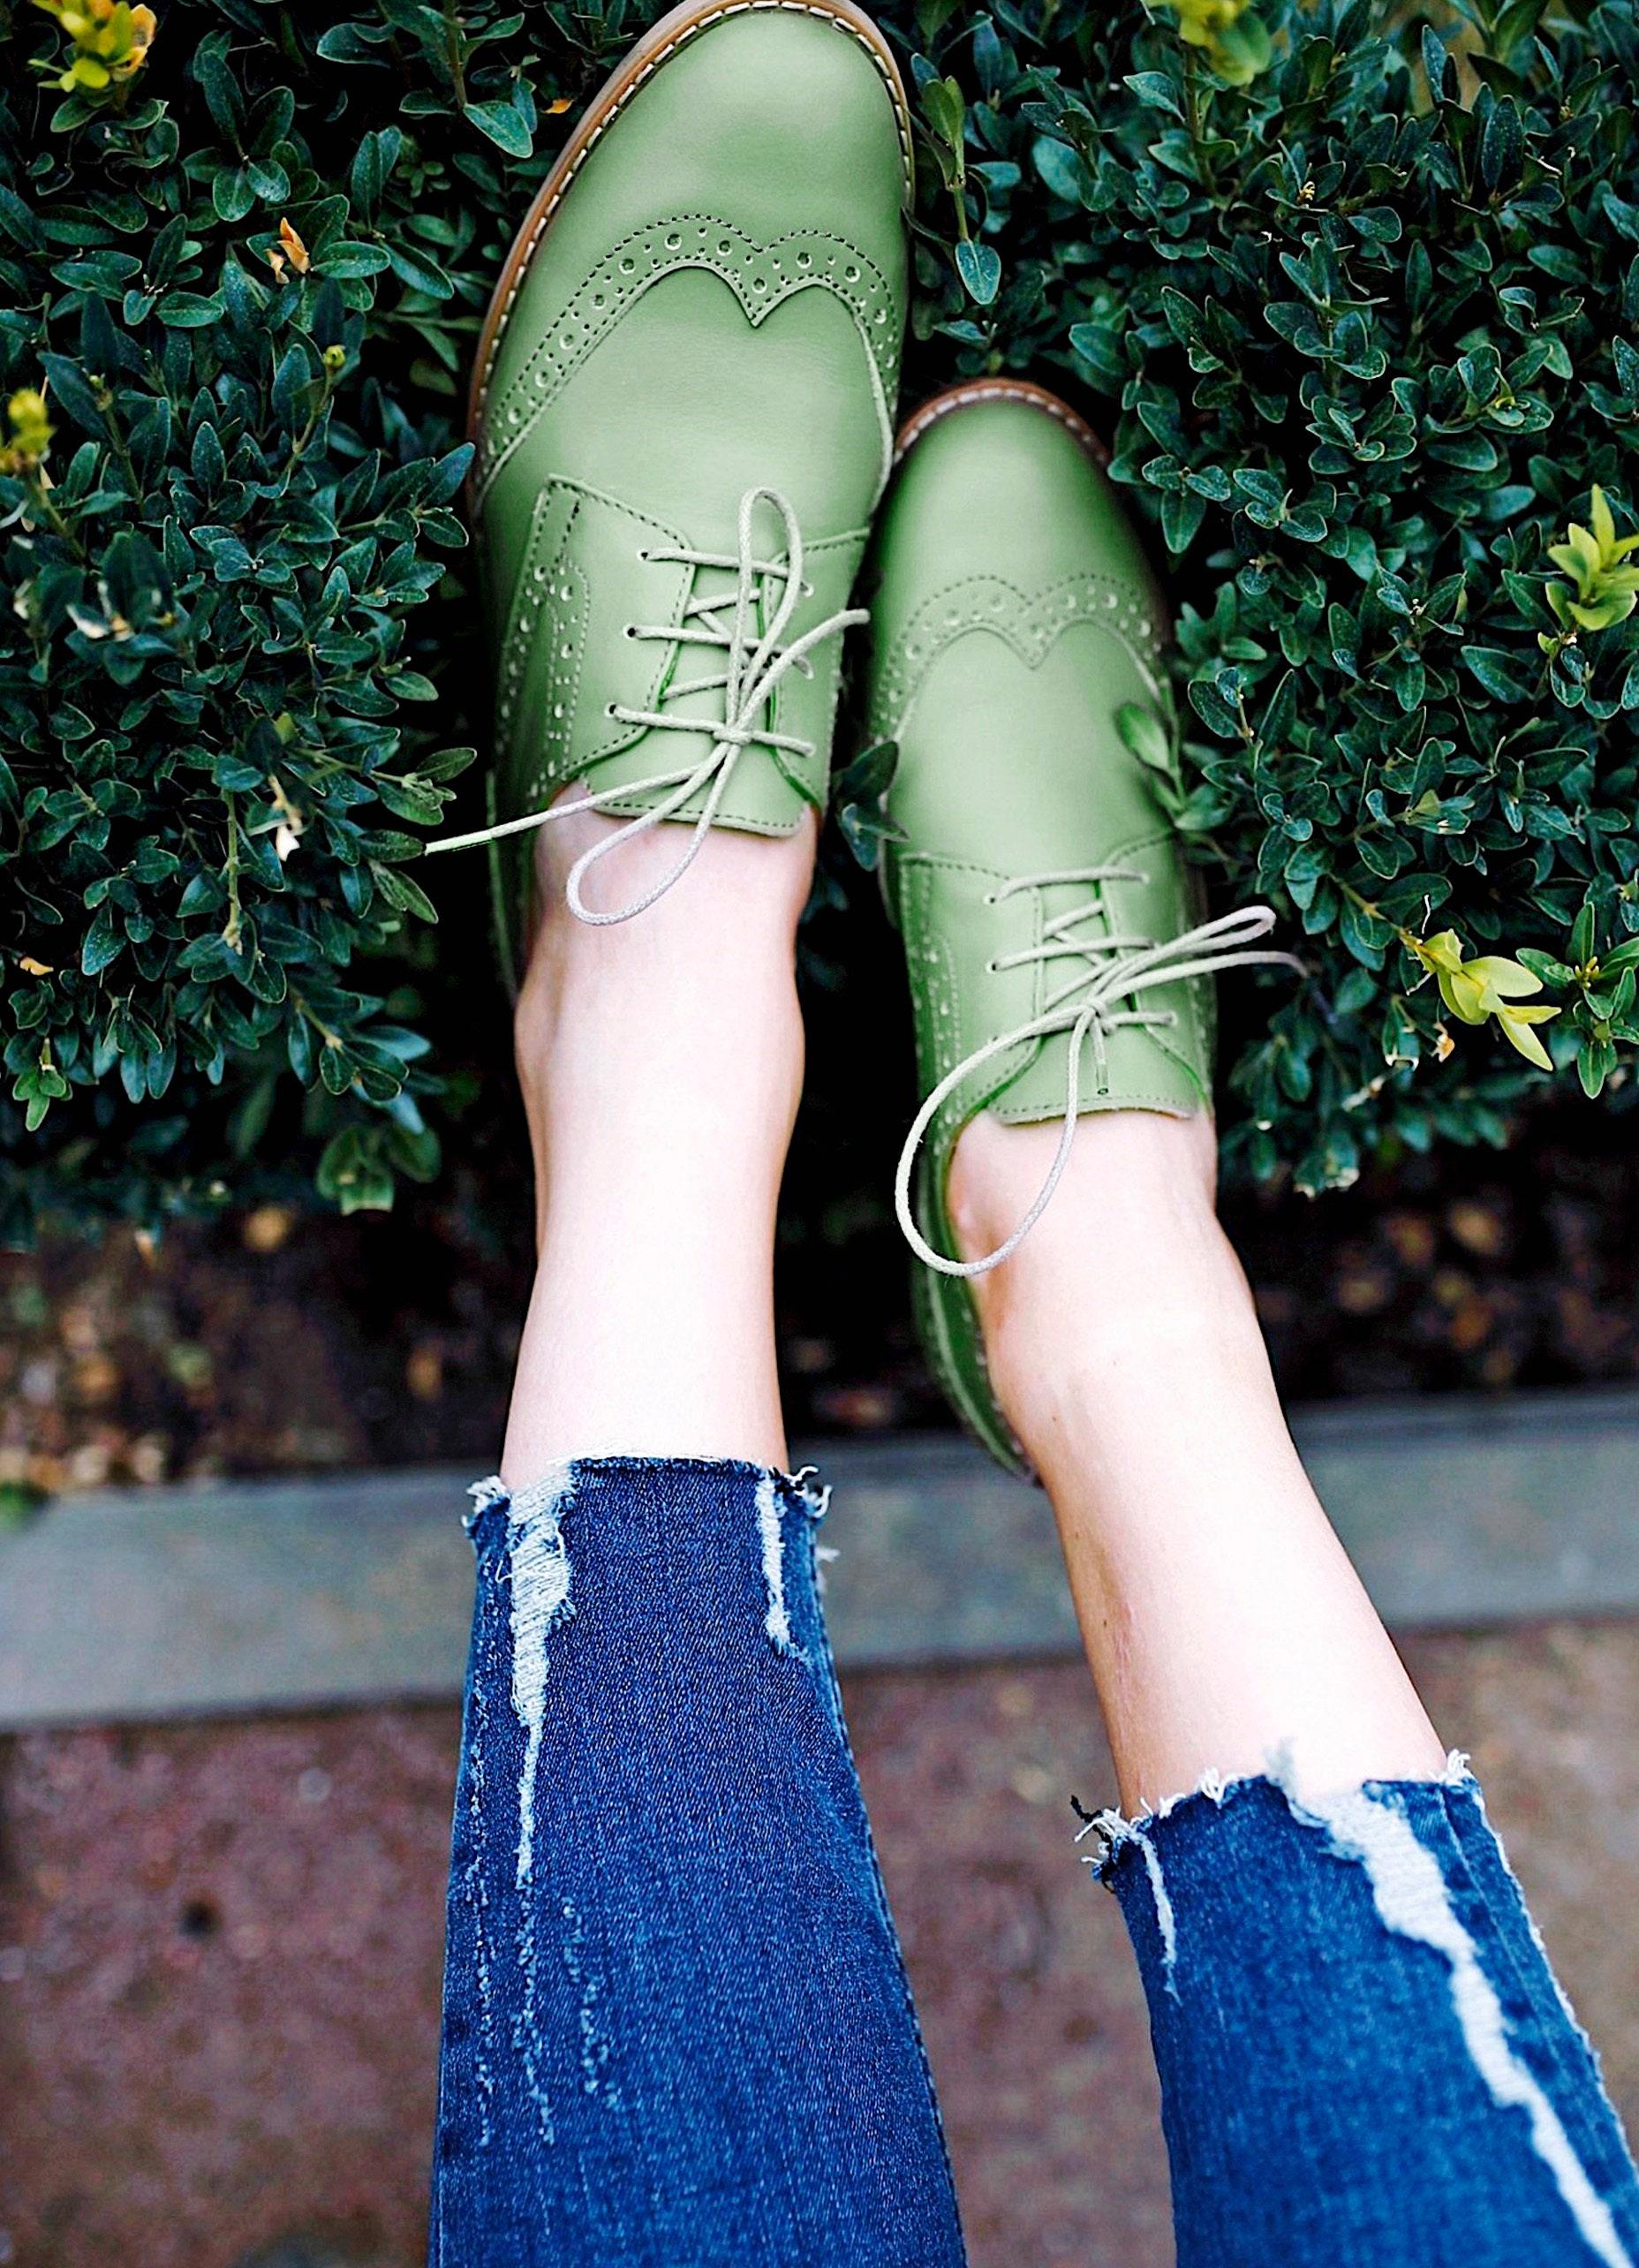 Heartbreak leather Brogues, wedding flat shoes, leather leather brogues, flat shoes, leather shoes, shoes, oxford shoes women, custom made shoes, tie shoes 0c6e95